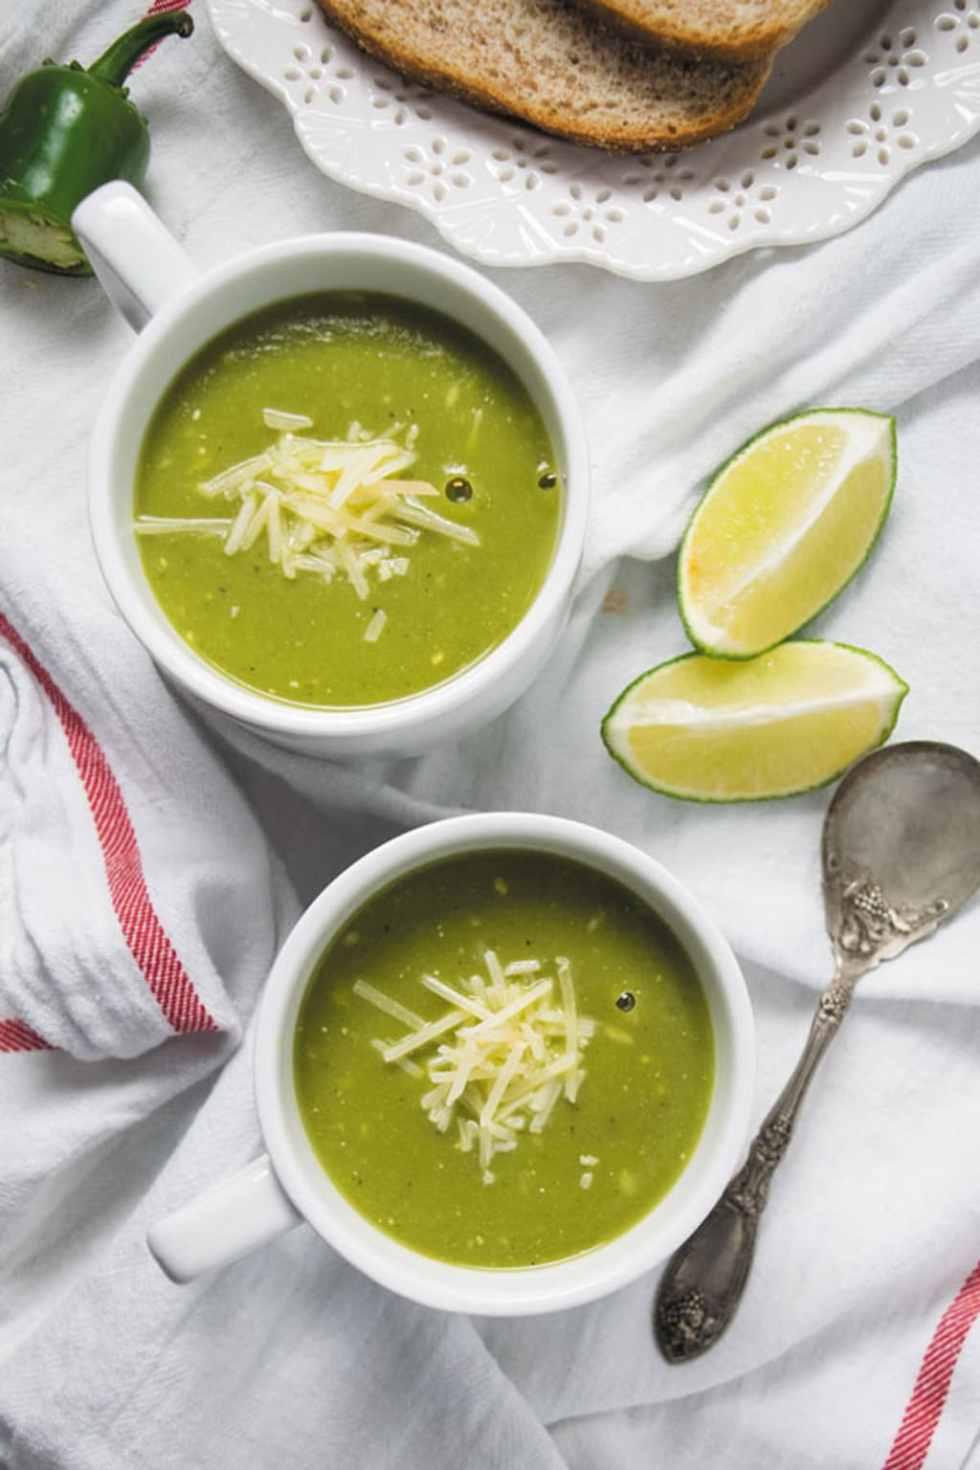 Pressure cooker zucchini basil soup